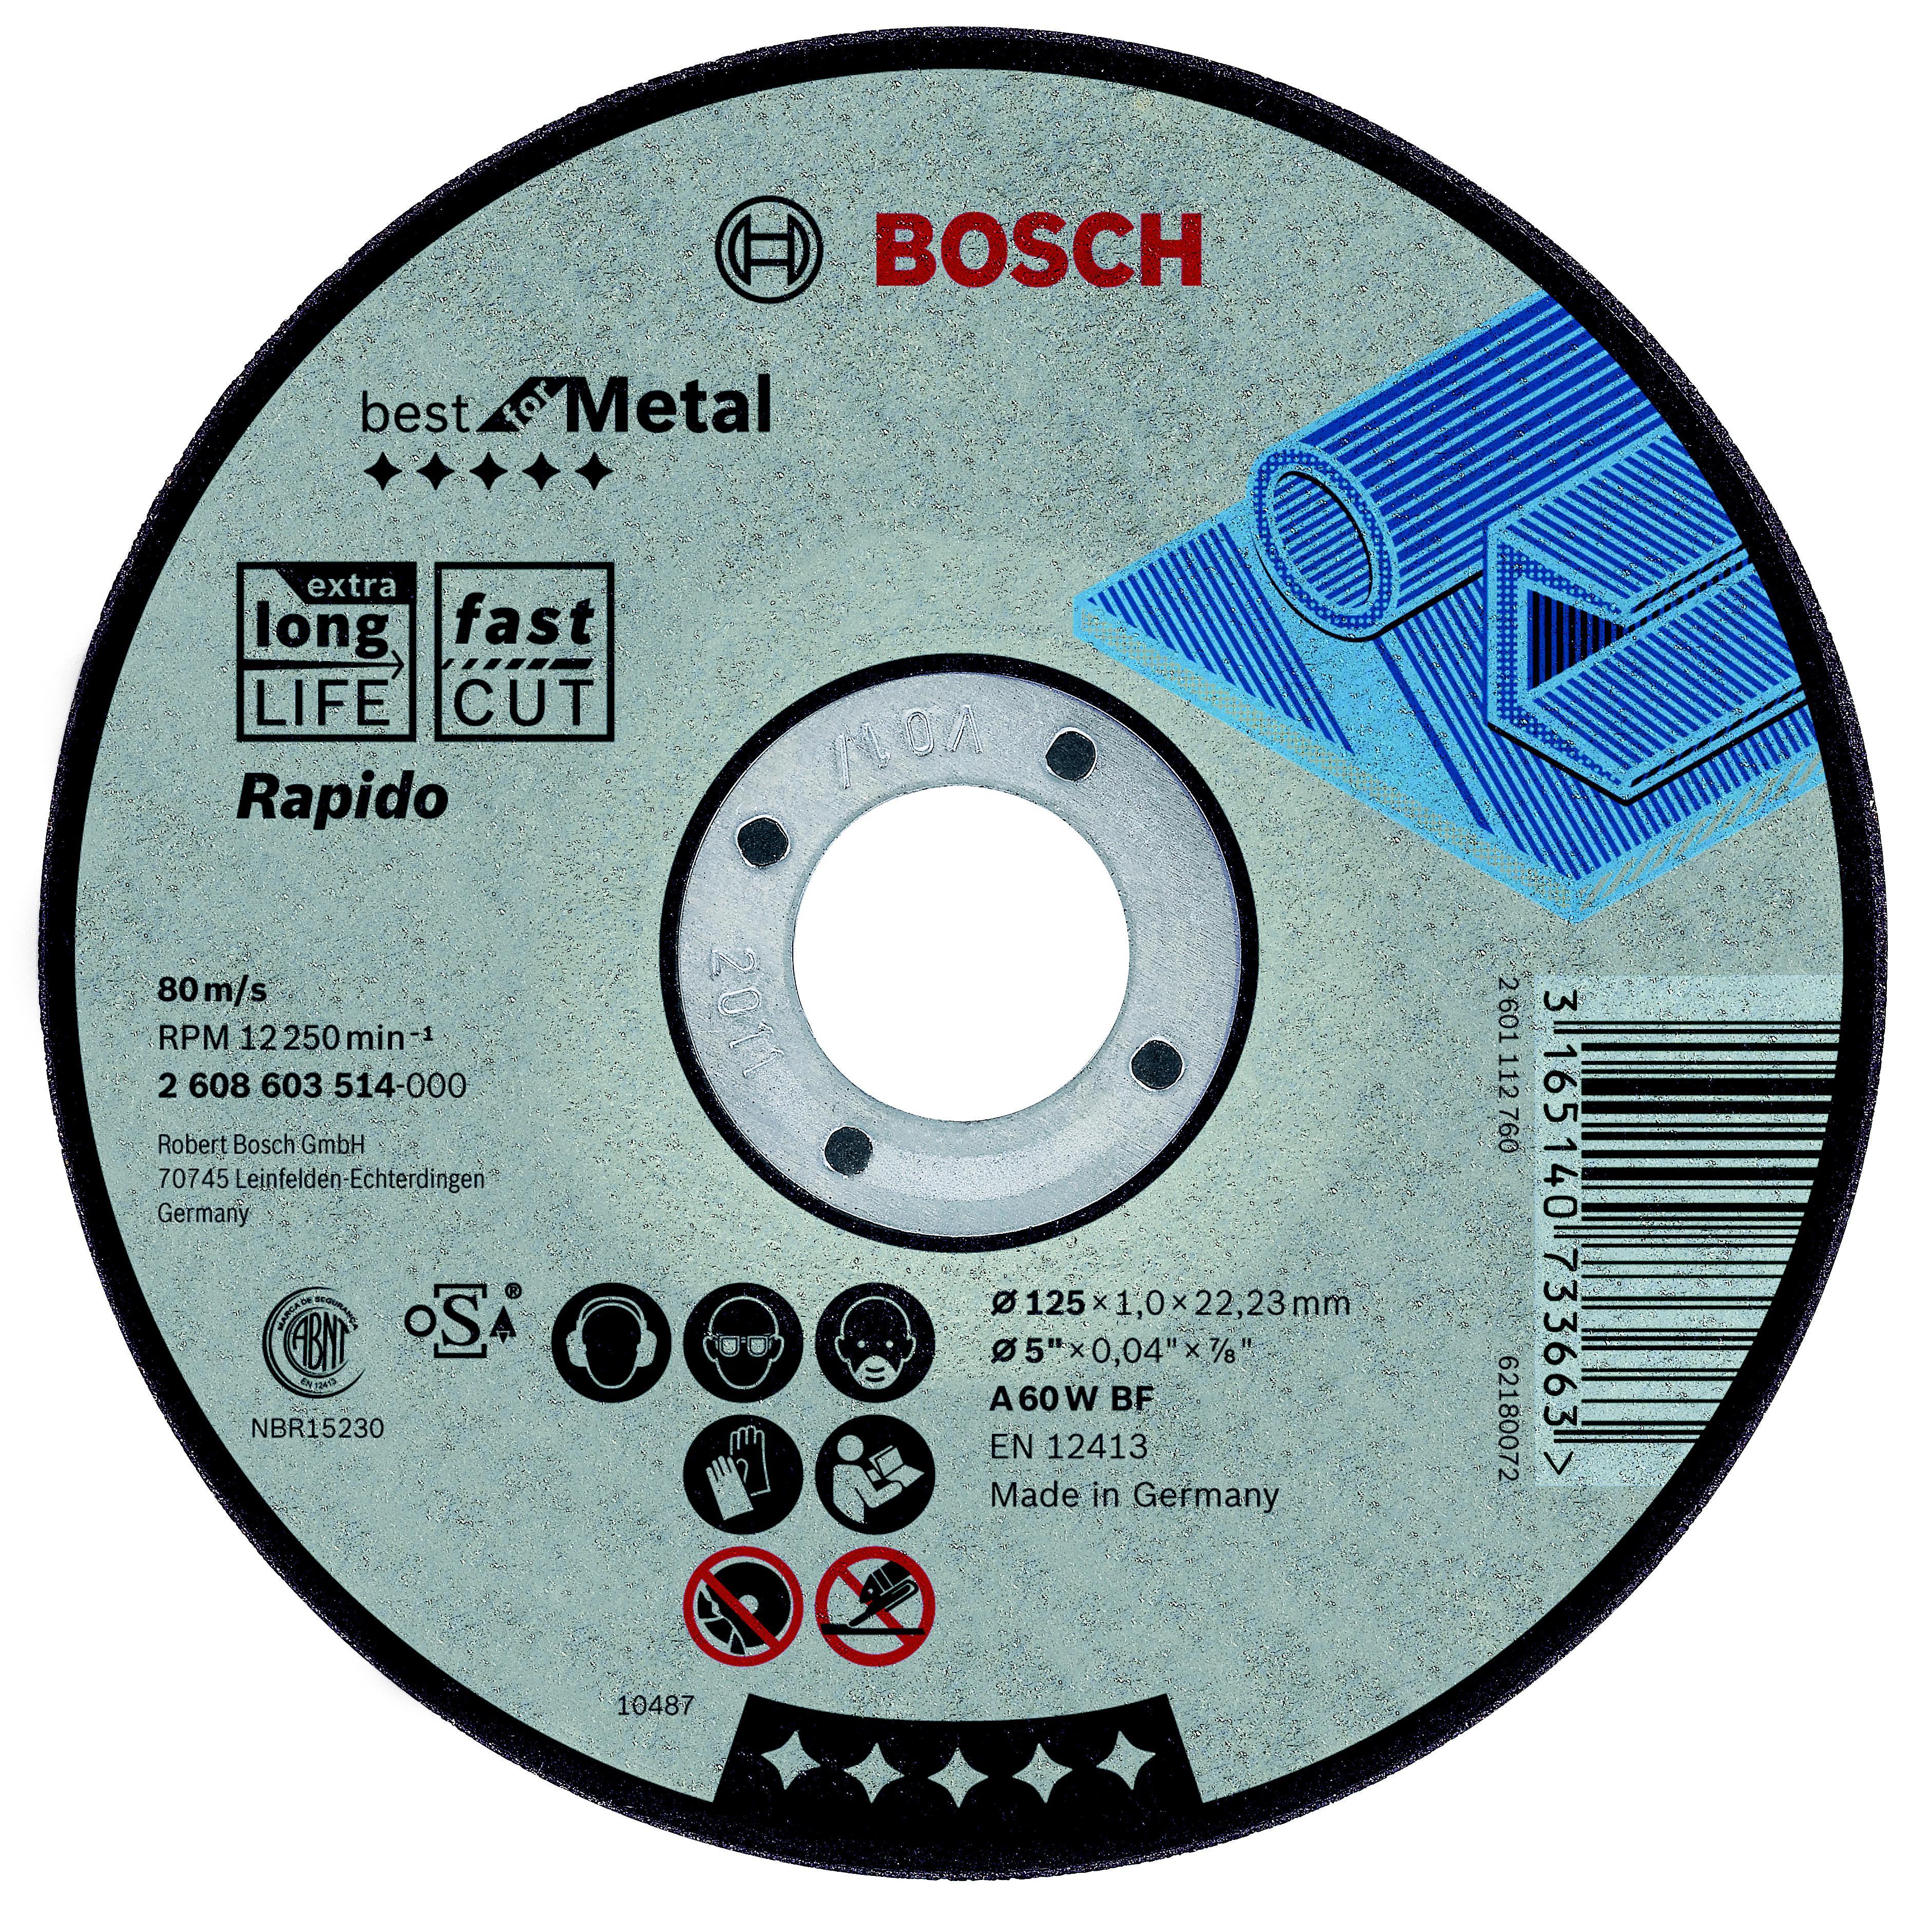 Круг отрезной Bosch 115х1х22 best for metal (2.608.603.512) круг отрезной bosch 115х1 5х22 best for metal 2 608 603 517